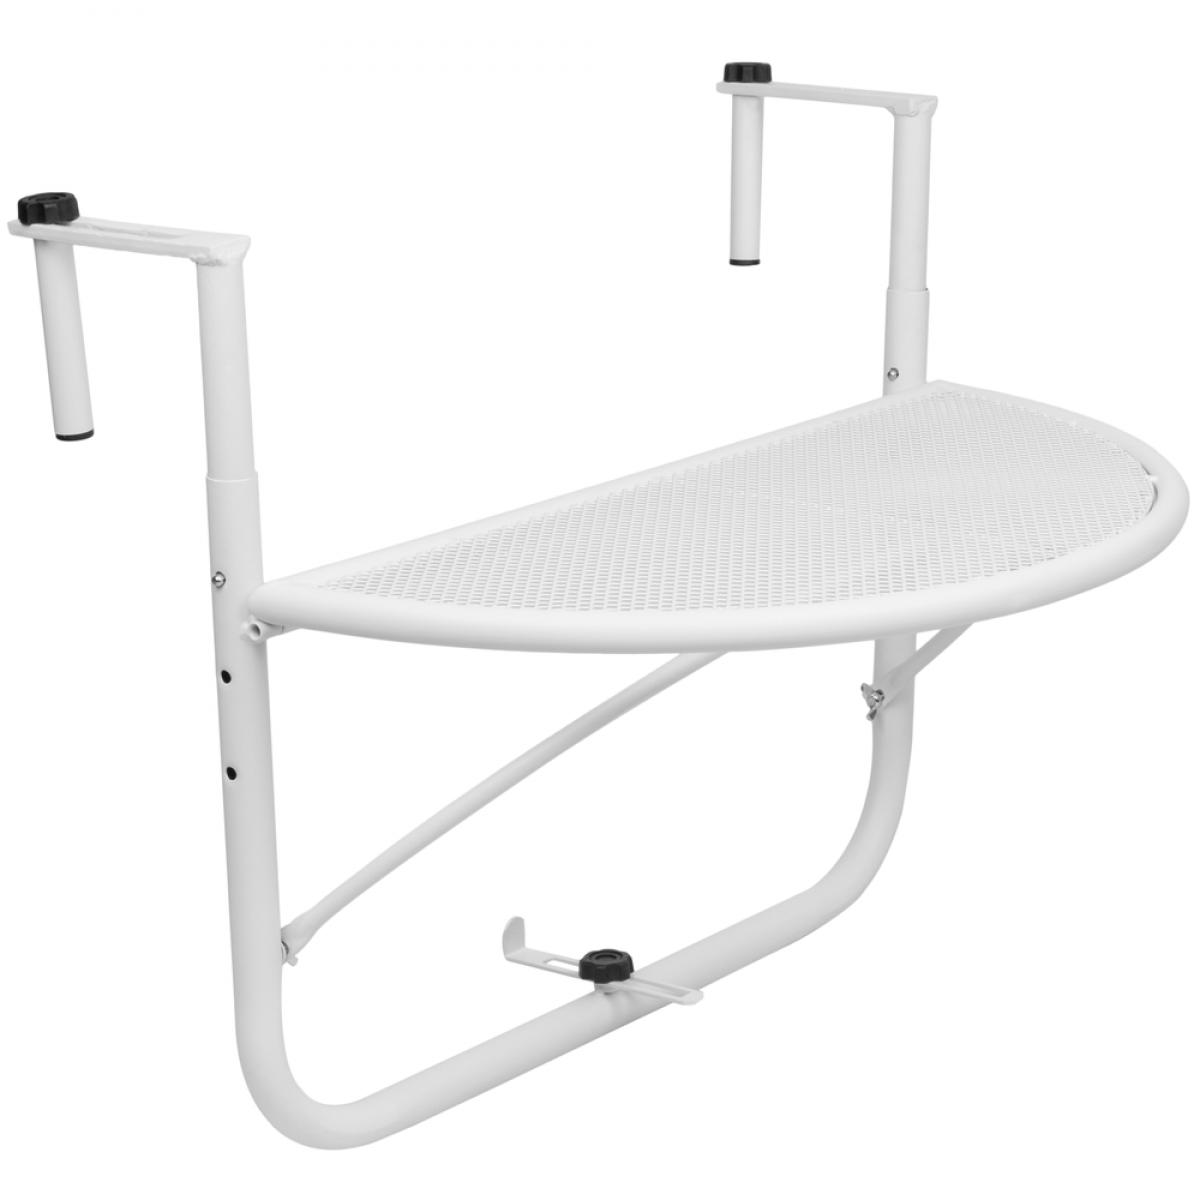 Primematik Table pliante semi-circulaire pour balcon 60x30cm blanc